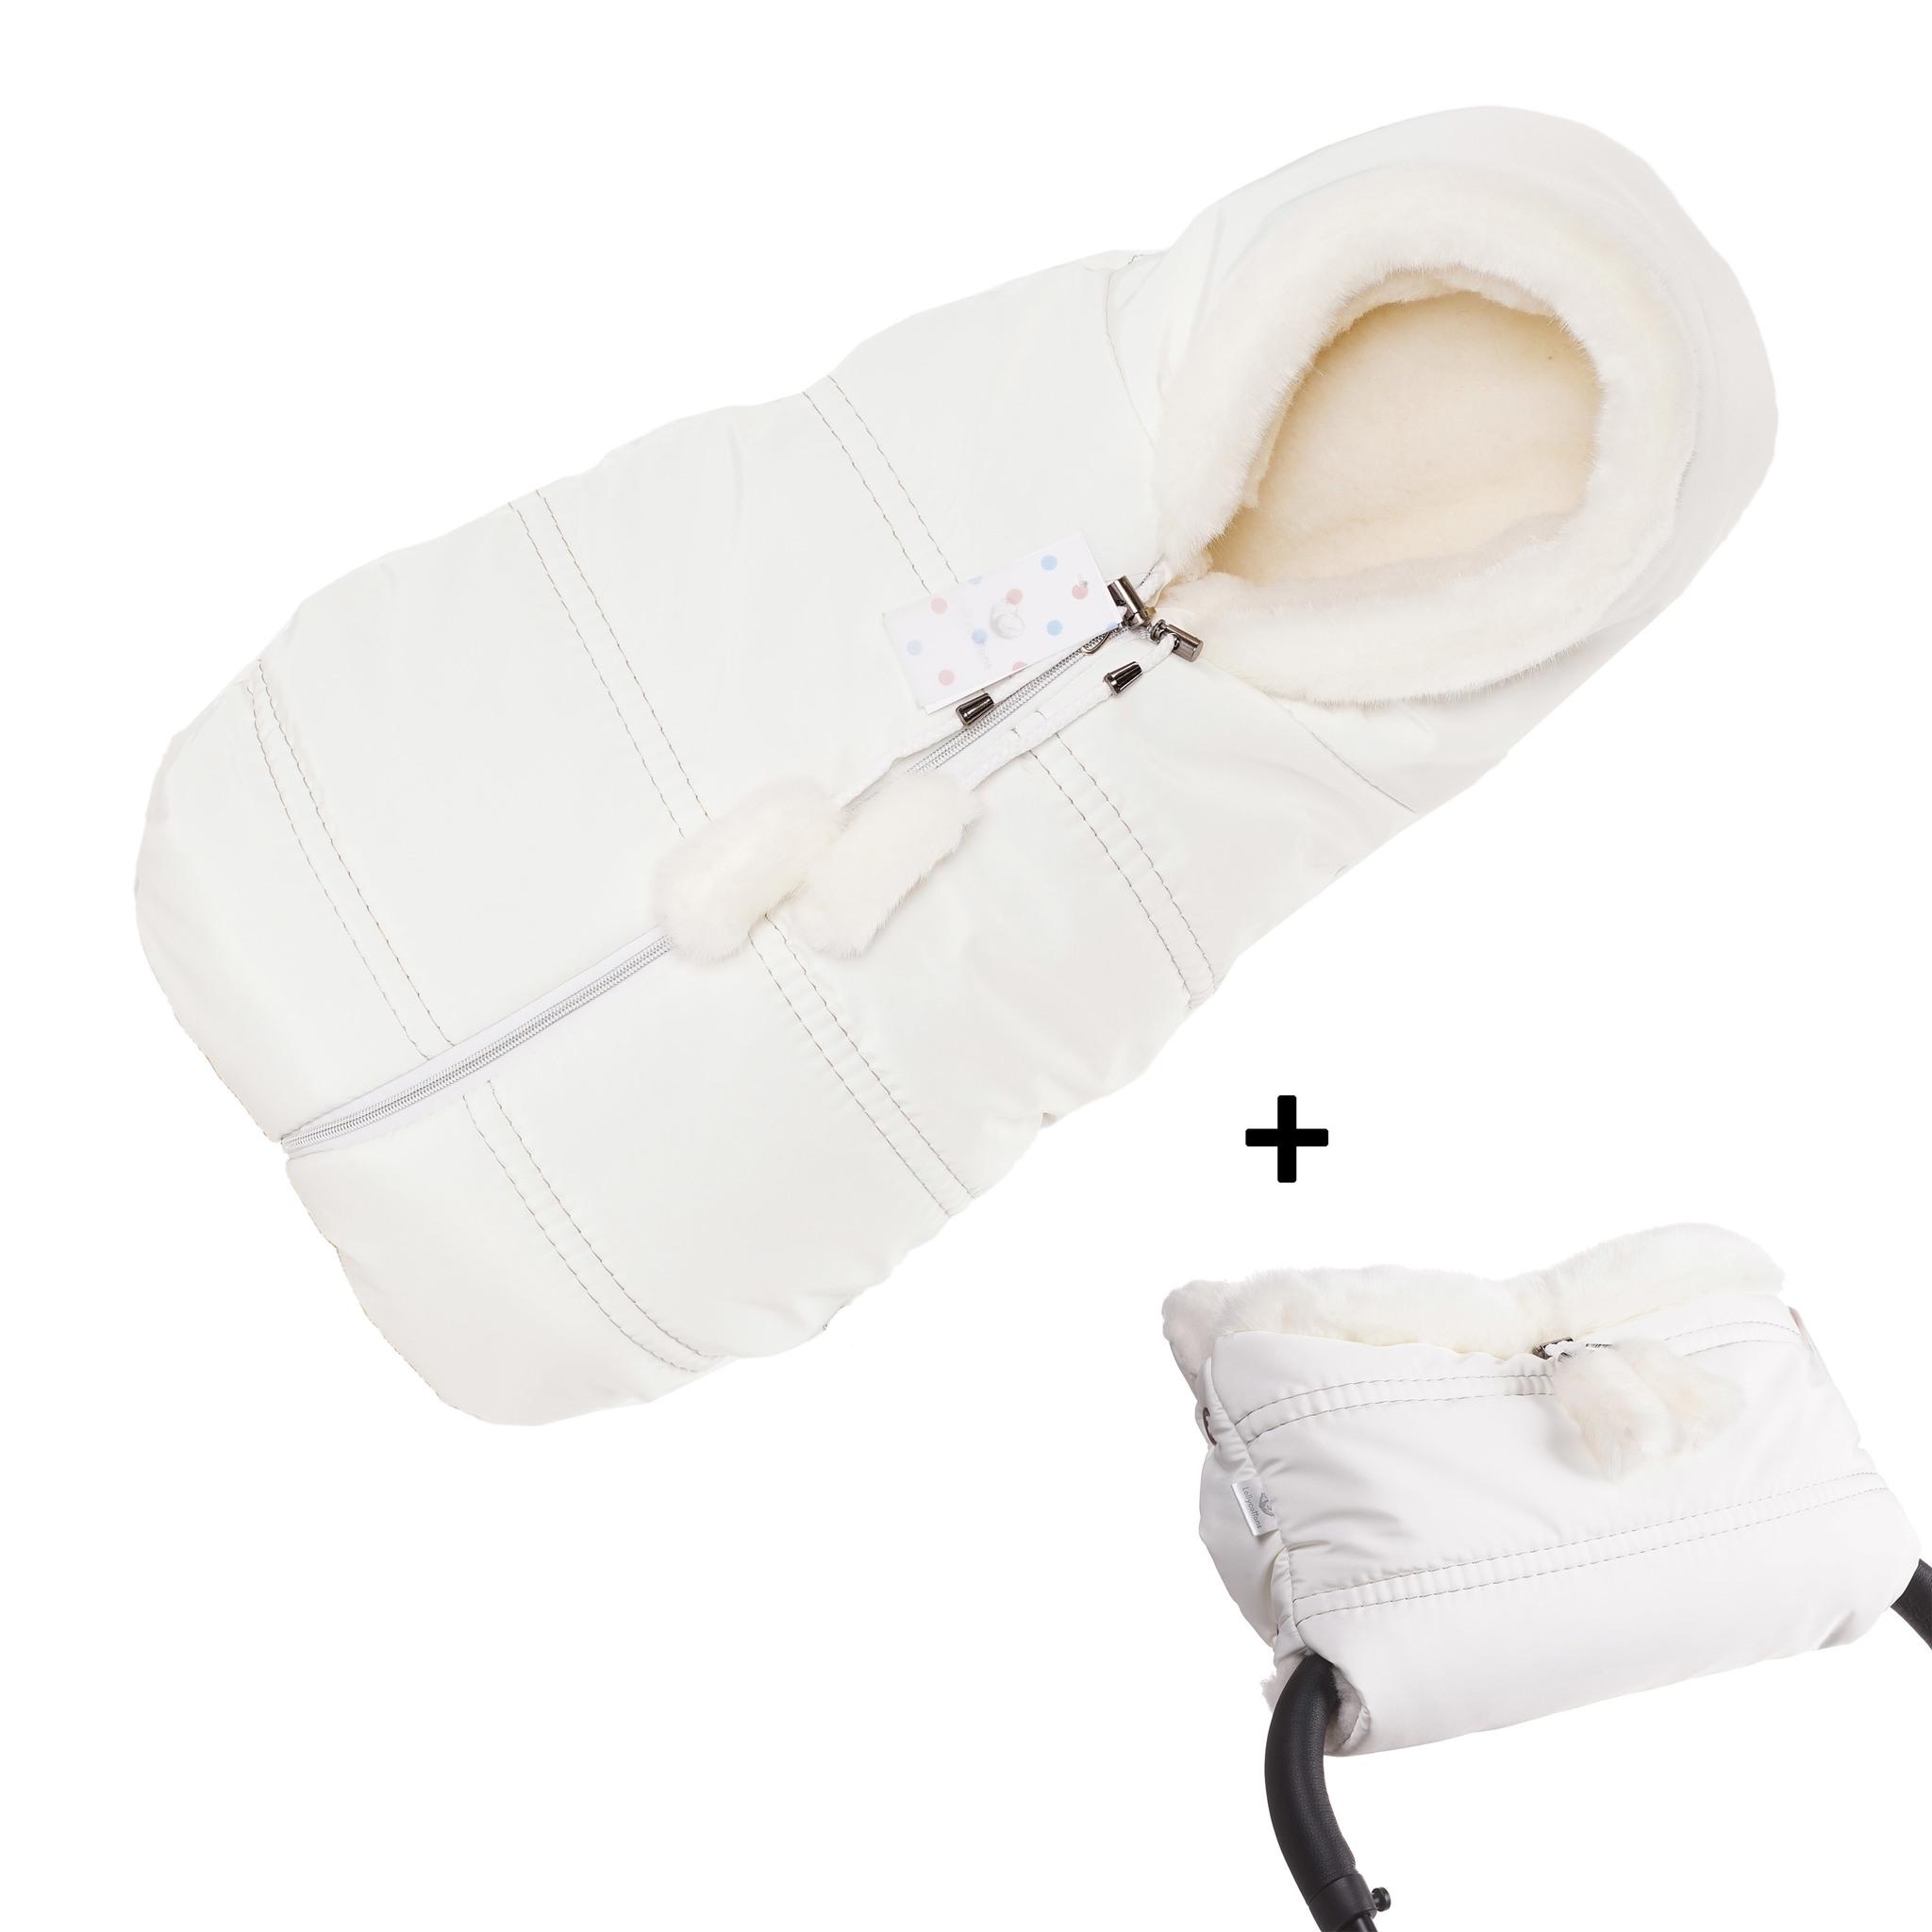 Муфты Lollycottons Комплект конверт + муфта Lollycottons молоко Конверт-КОКОН--Lolly-cotons---MAXI-SAVE_-молоко.jpg